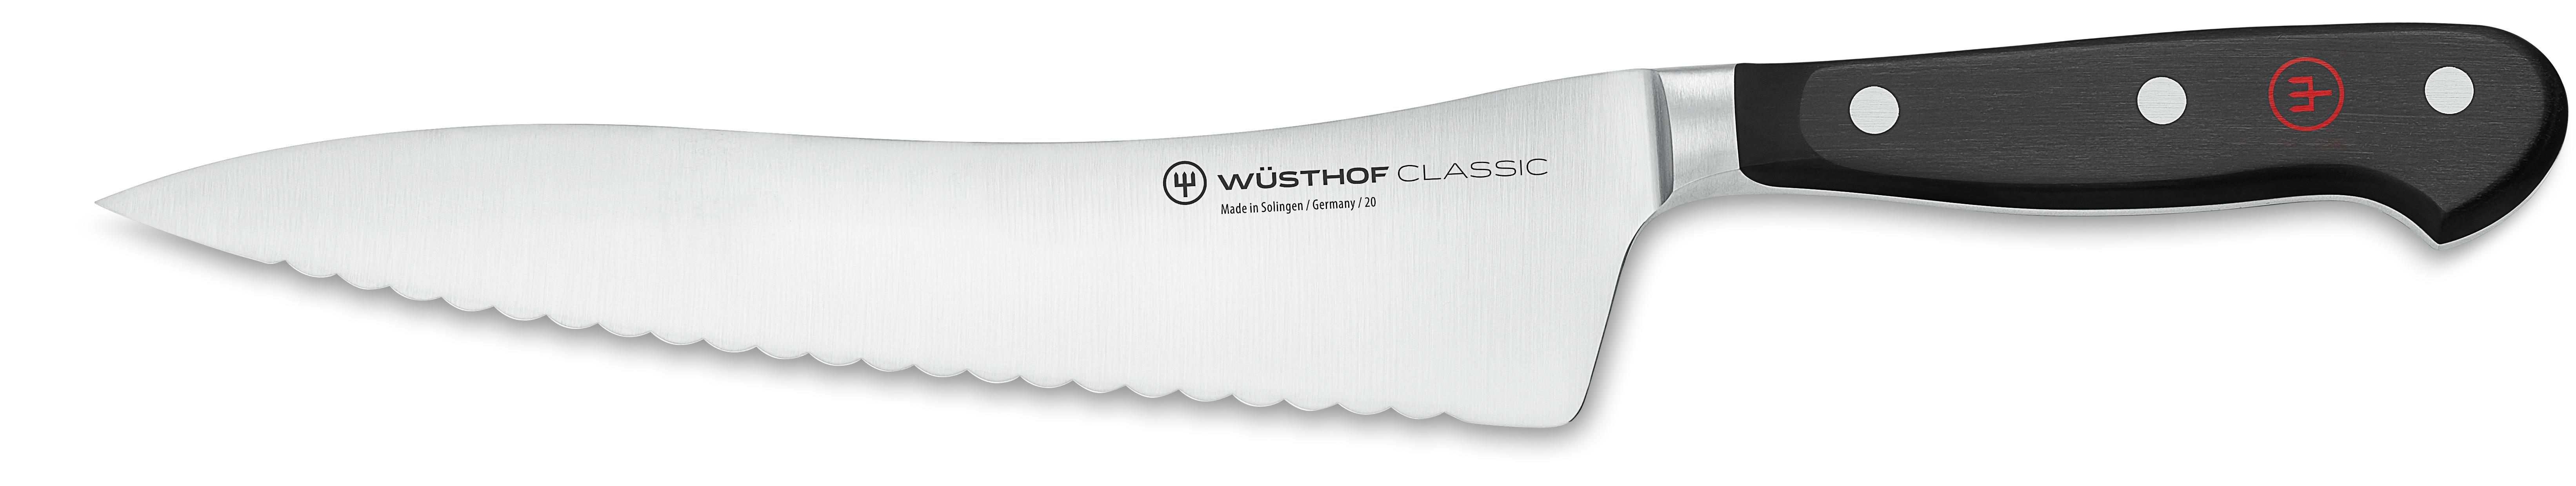 Wusthof Classic Wavy Bread Knife